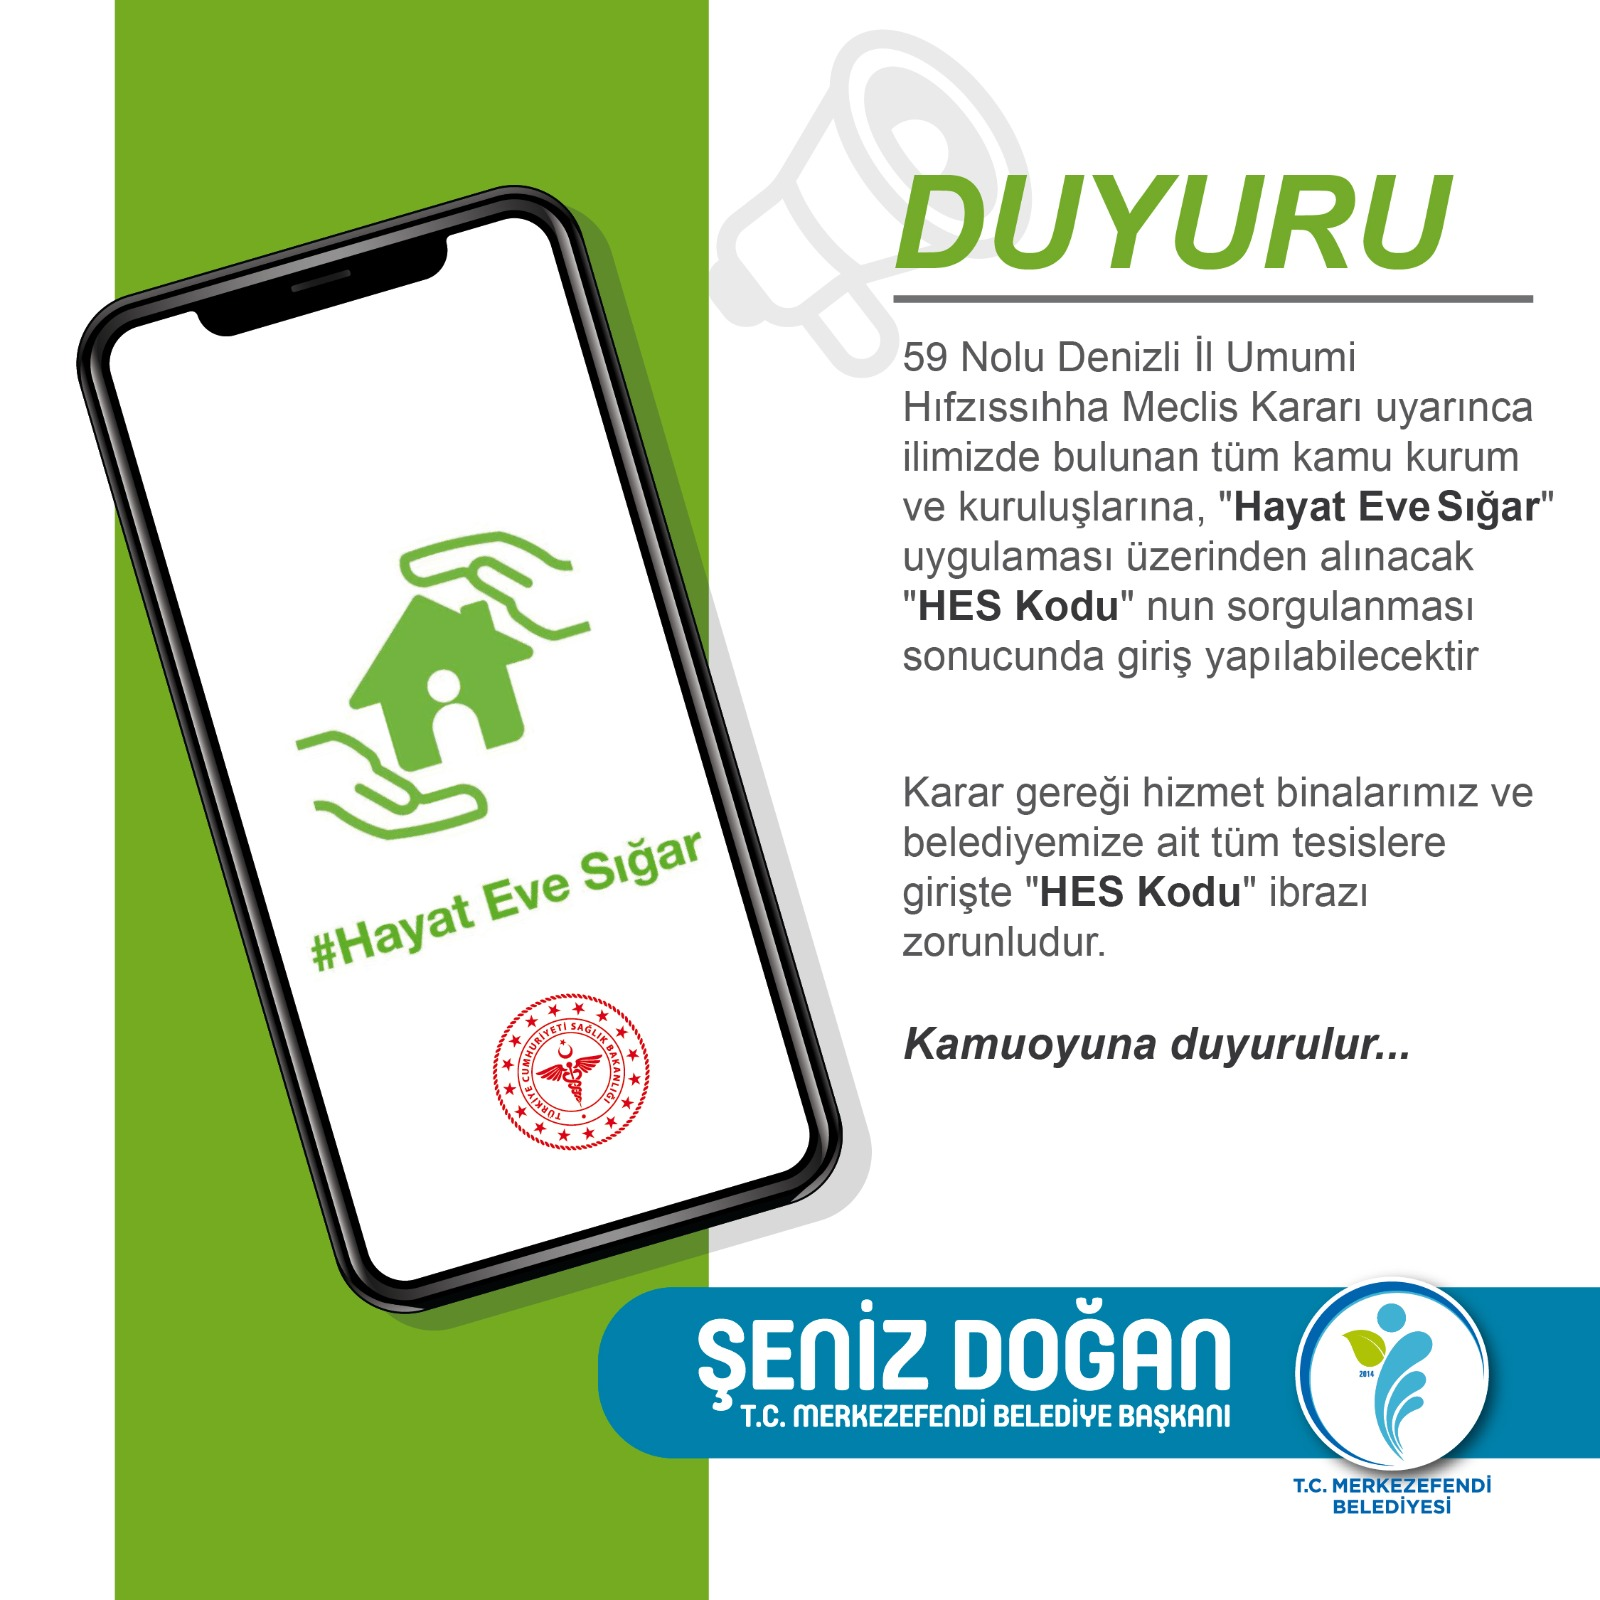 WhatsApp Image 2020 09 20 at 14.43.15 - MERKEZEFENDİ BELEDİYESİ'NDE HES KODU UYGULAMASI